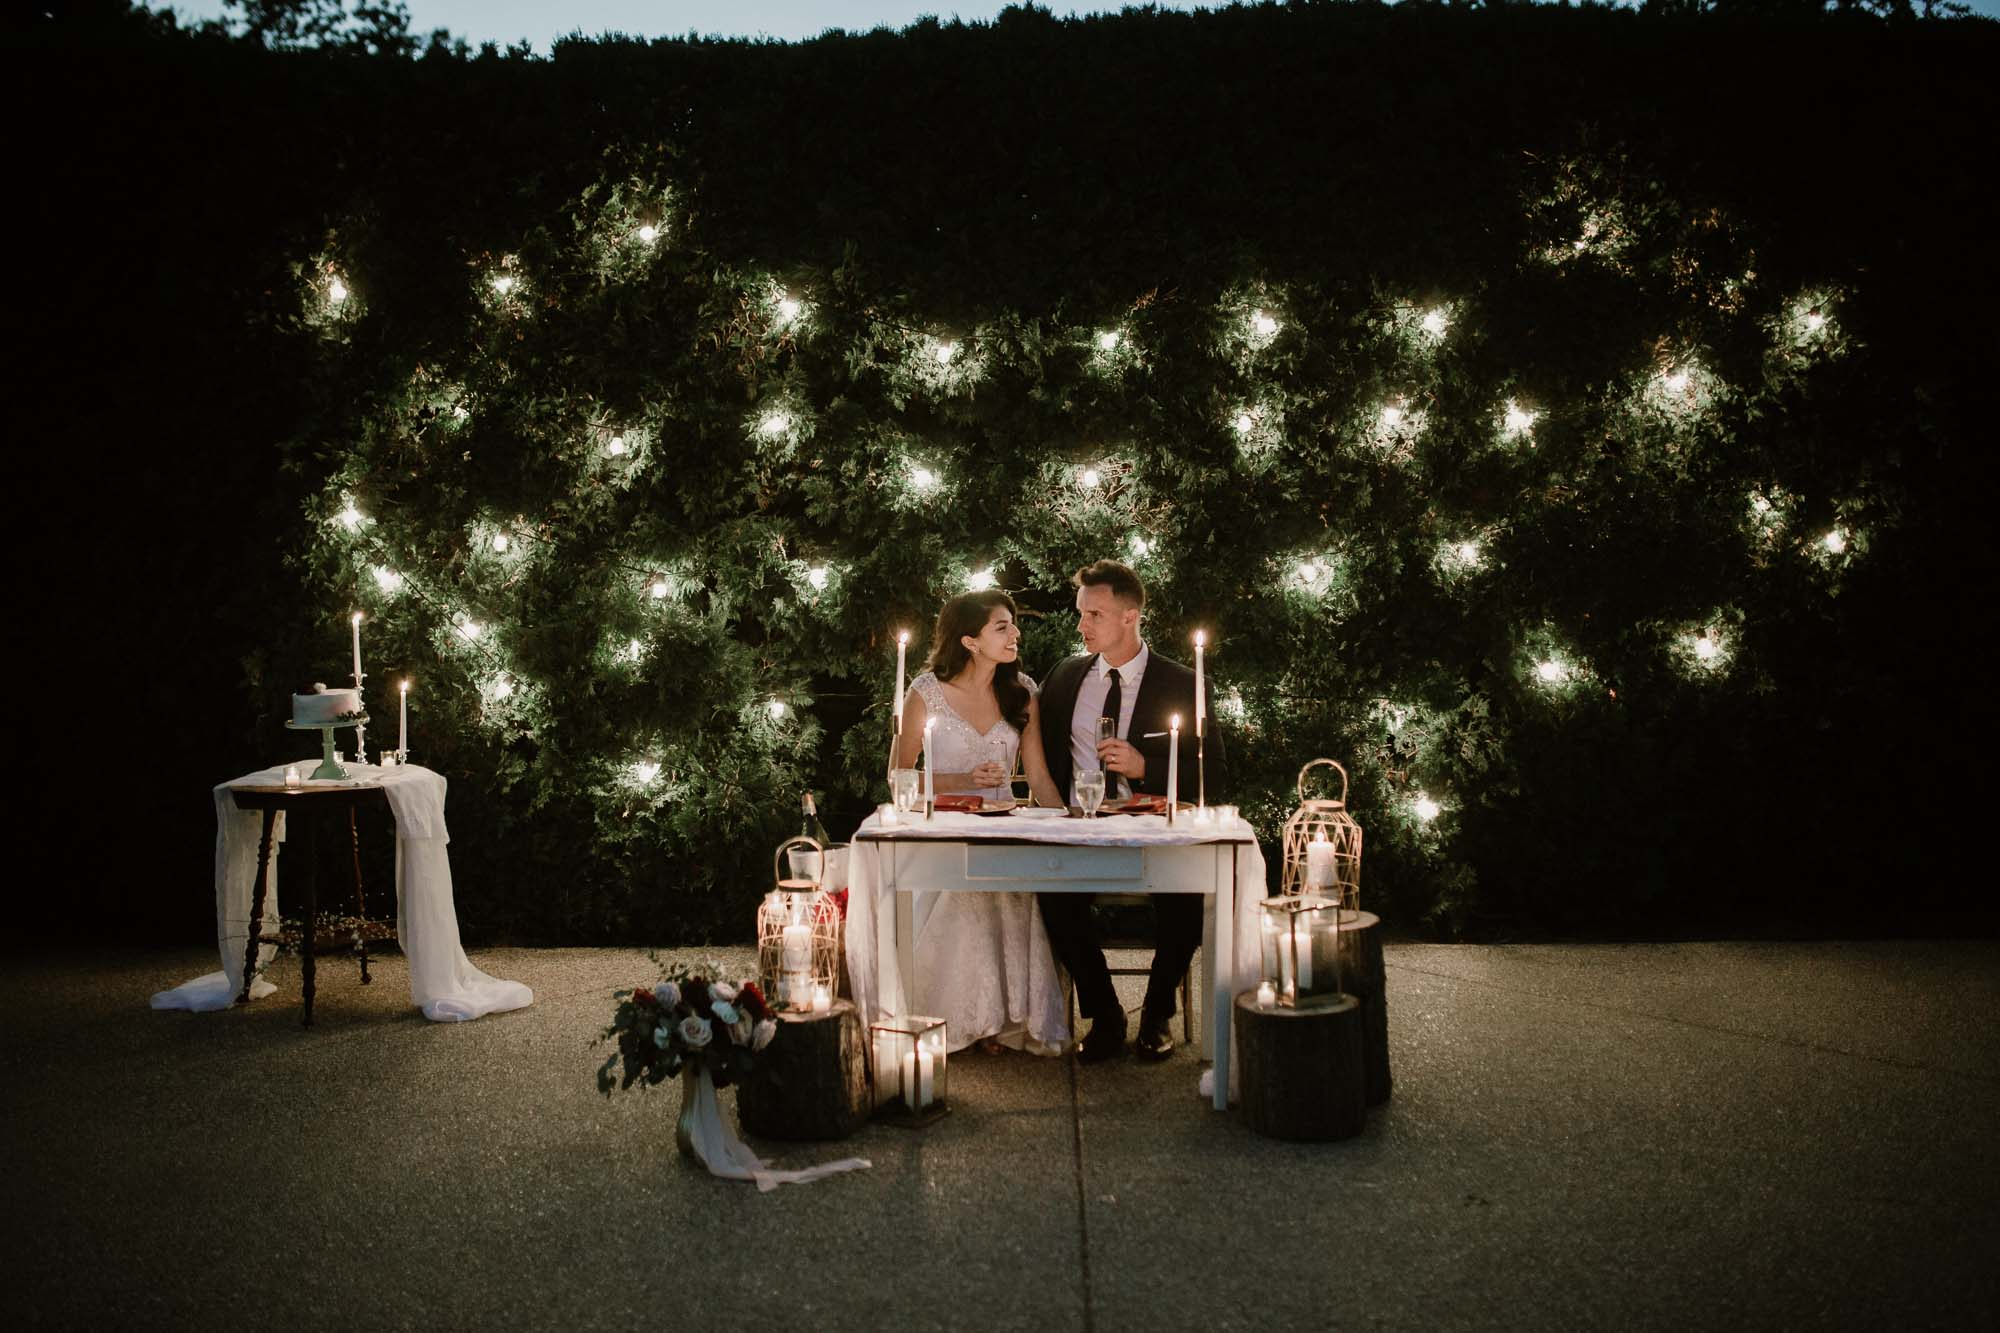 champaign_il_wedding_photography-0960.jpg